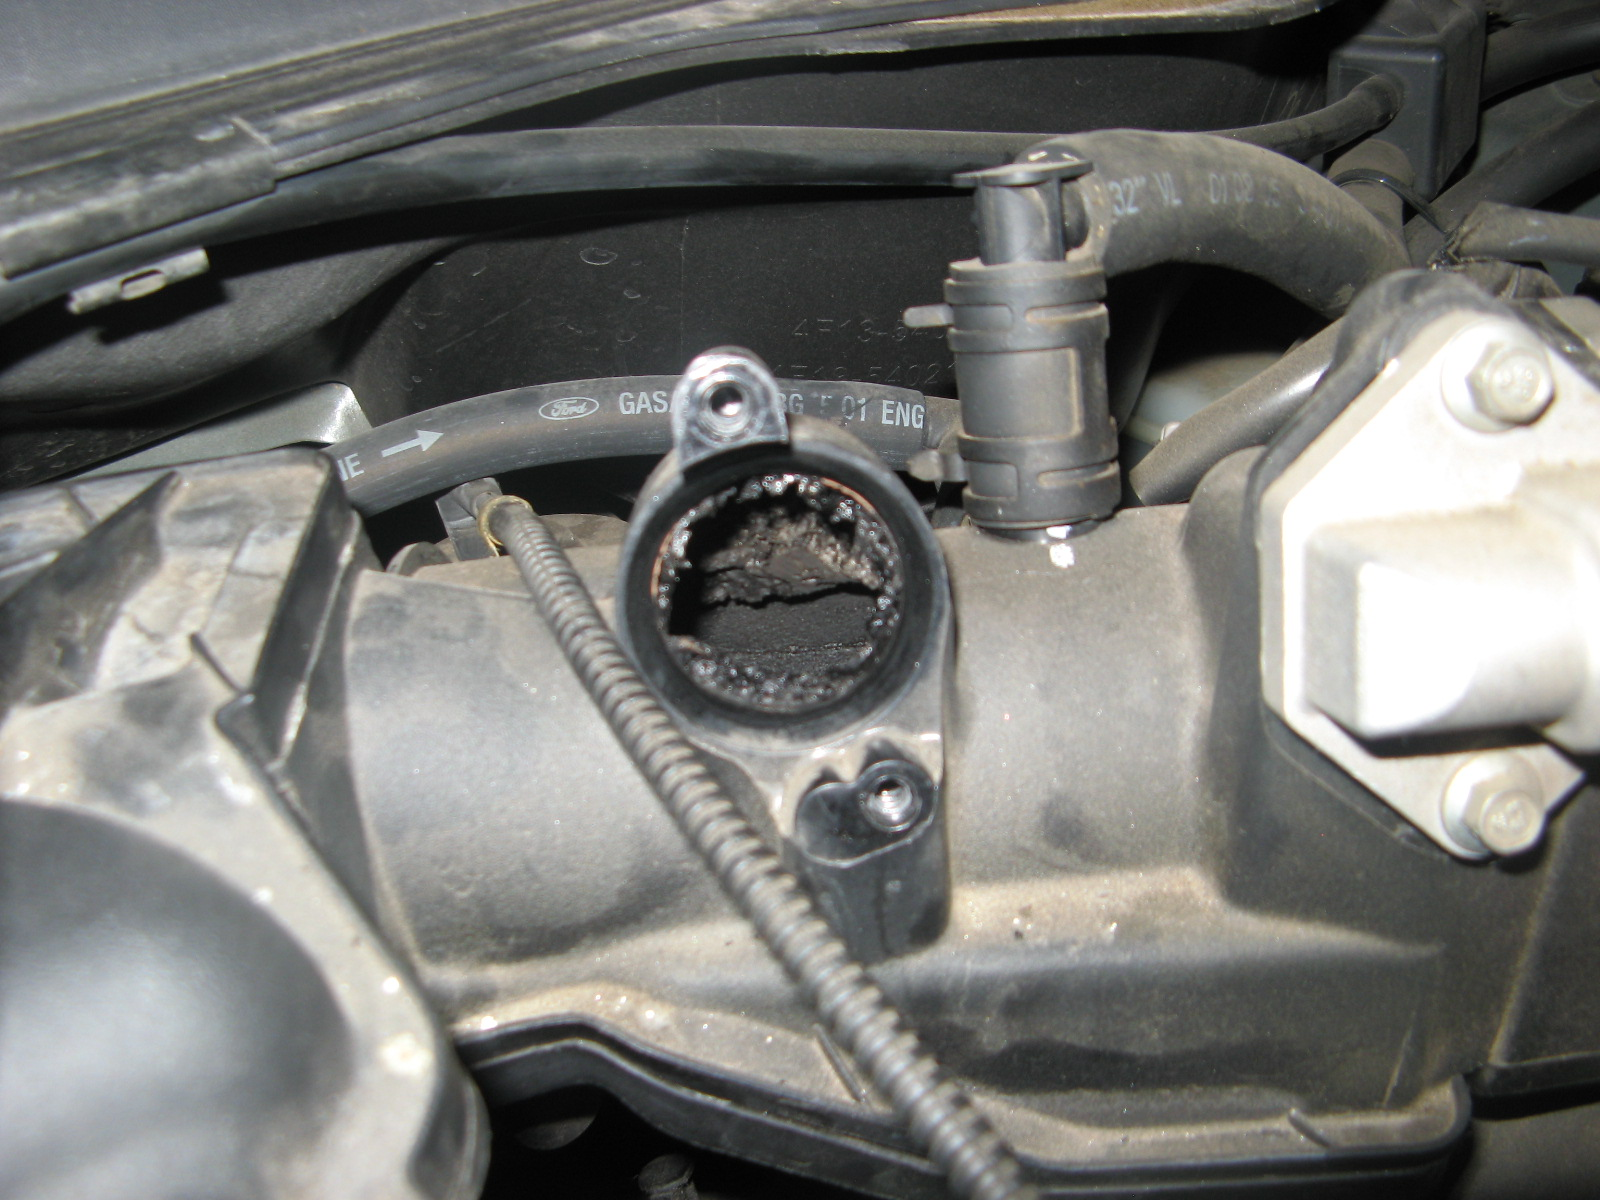 Ford Taurus Reviews >> PCV hose connector melting, what causes? - Taurus Car Club of America : Ford Taurus Forum